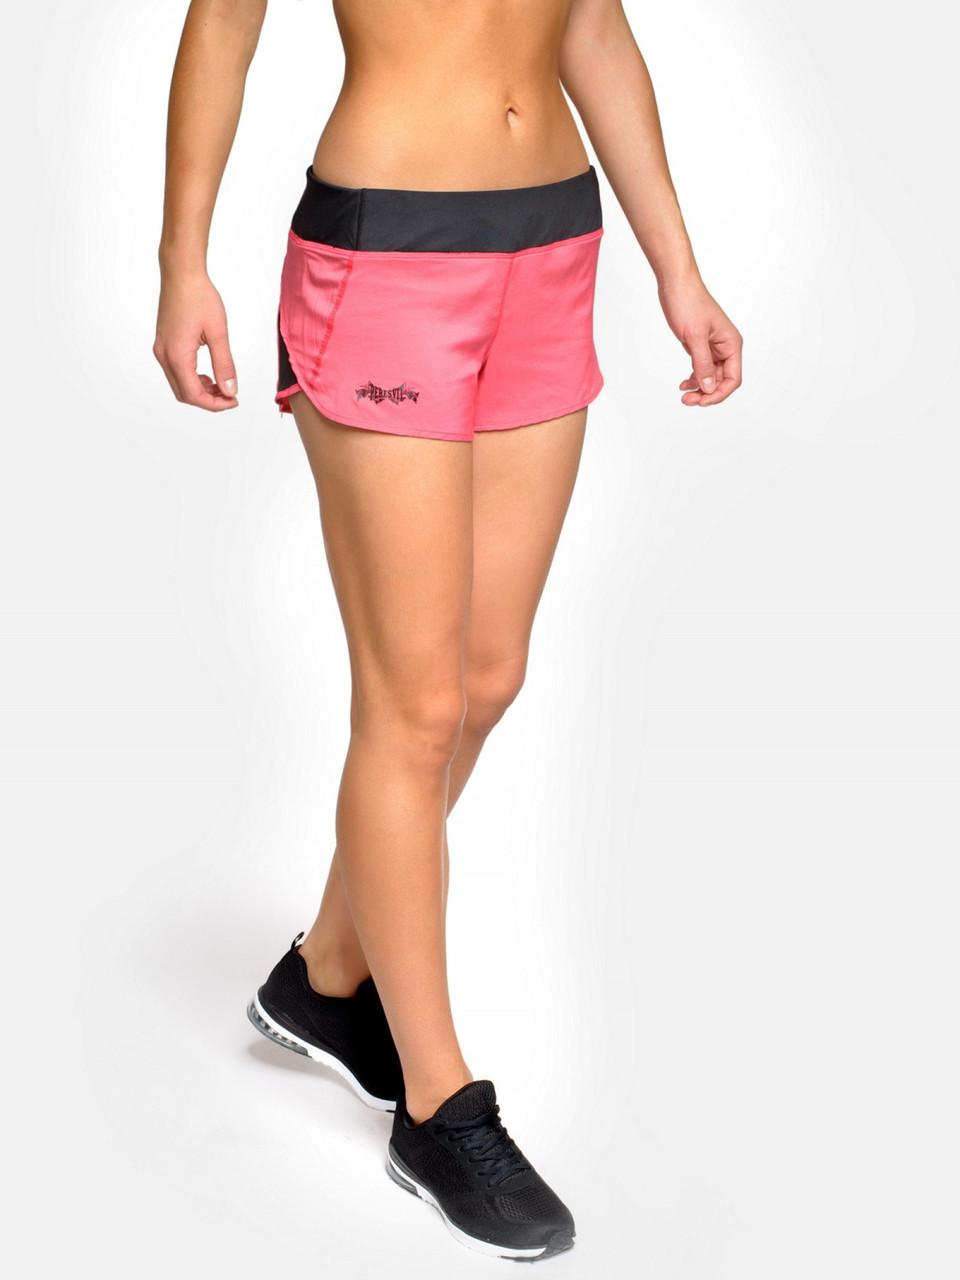 Спортивные шорты Peresvit Air Motion Women's Shorts Raspberry